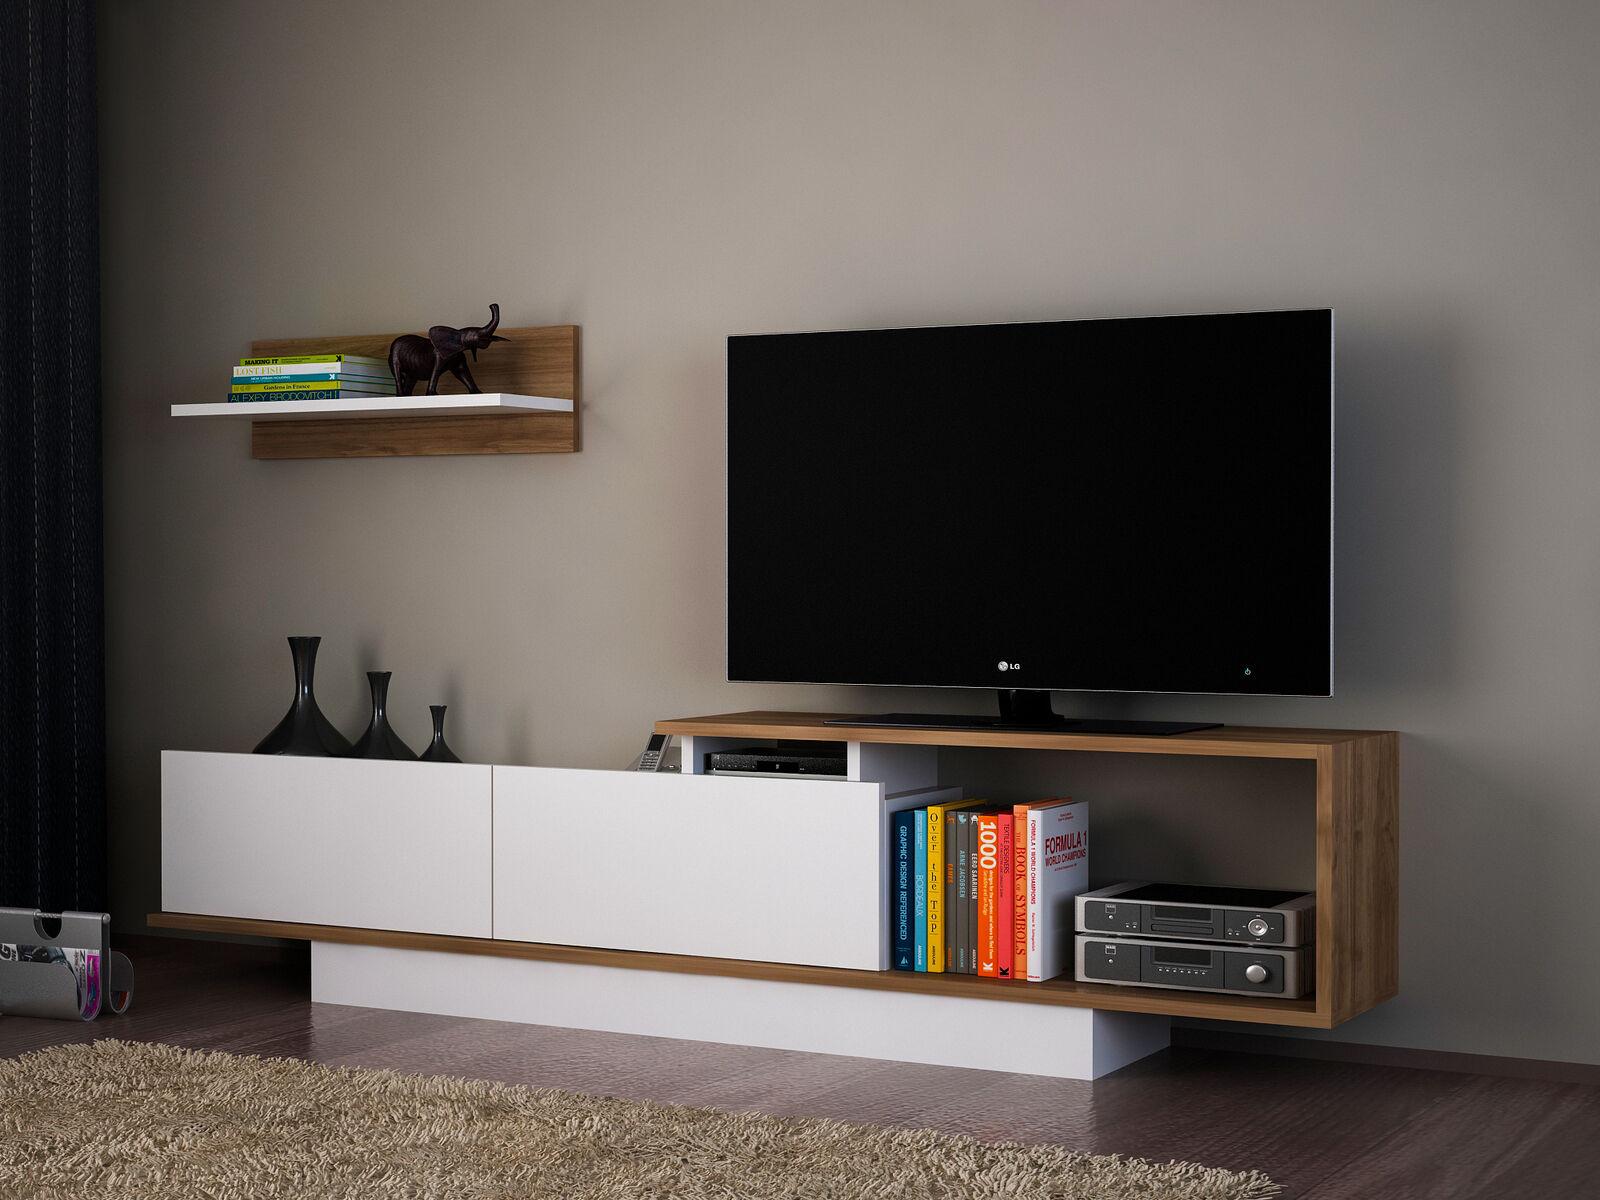 Wohnwand Weiss Tv Lowboard Holz Wohnzimmerschrank Modern Sideboard Anbauwand 3573 Mobel